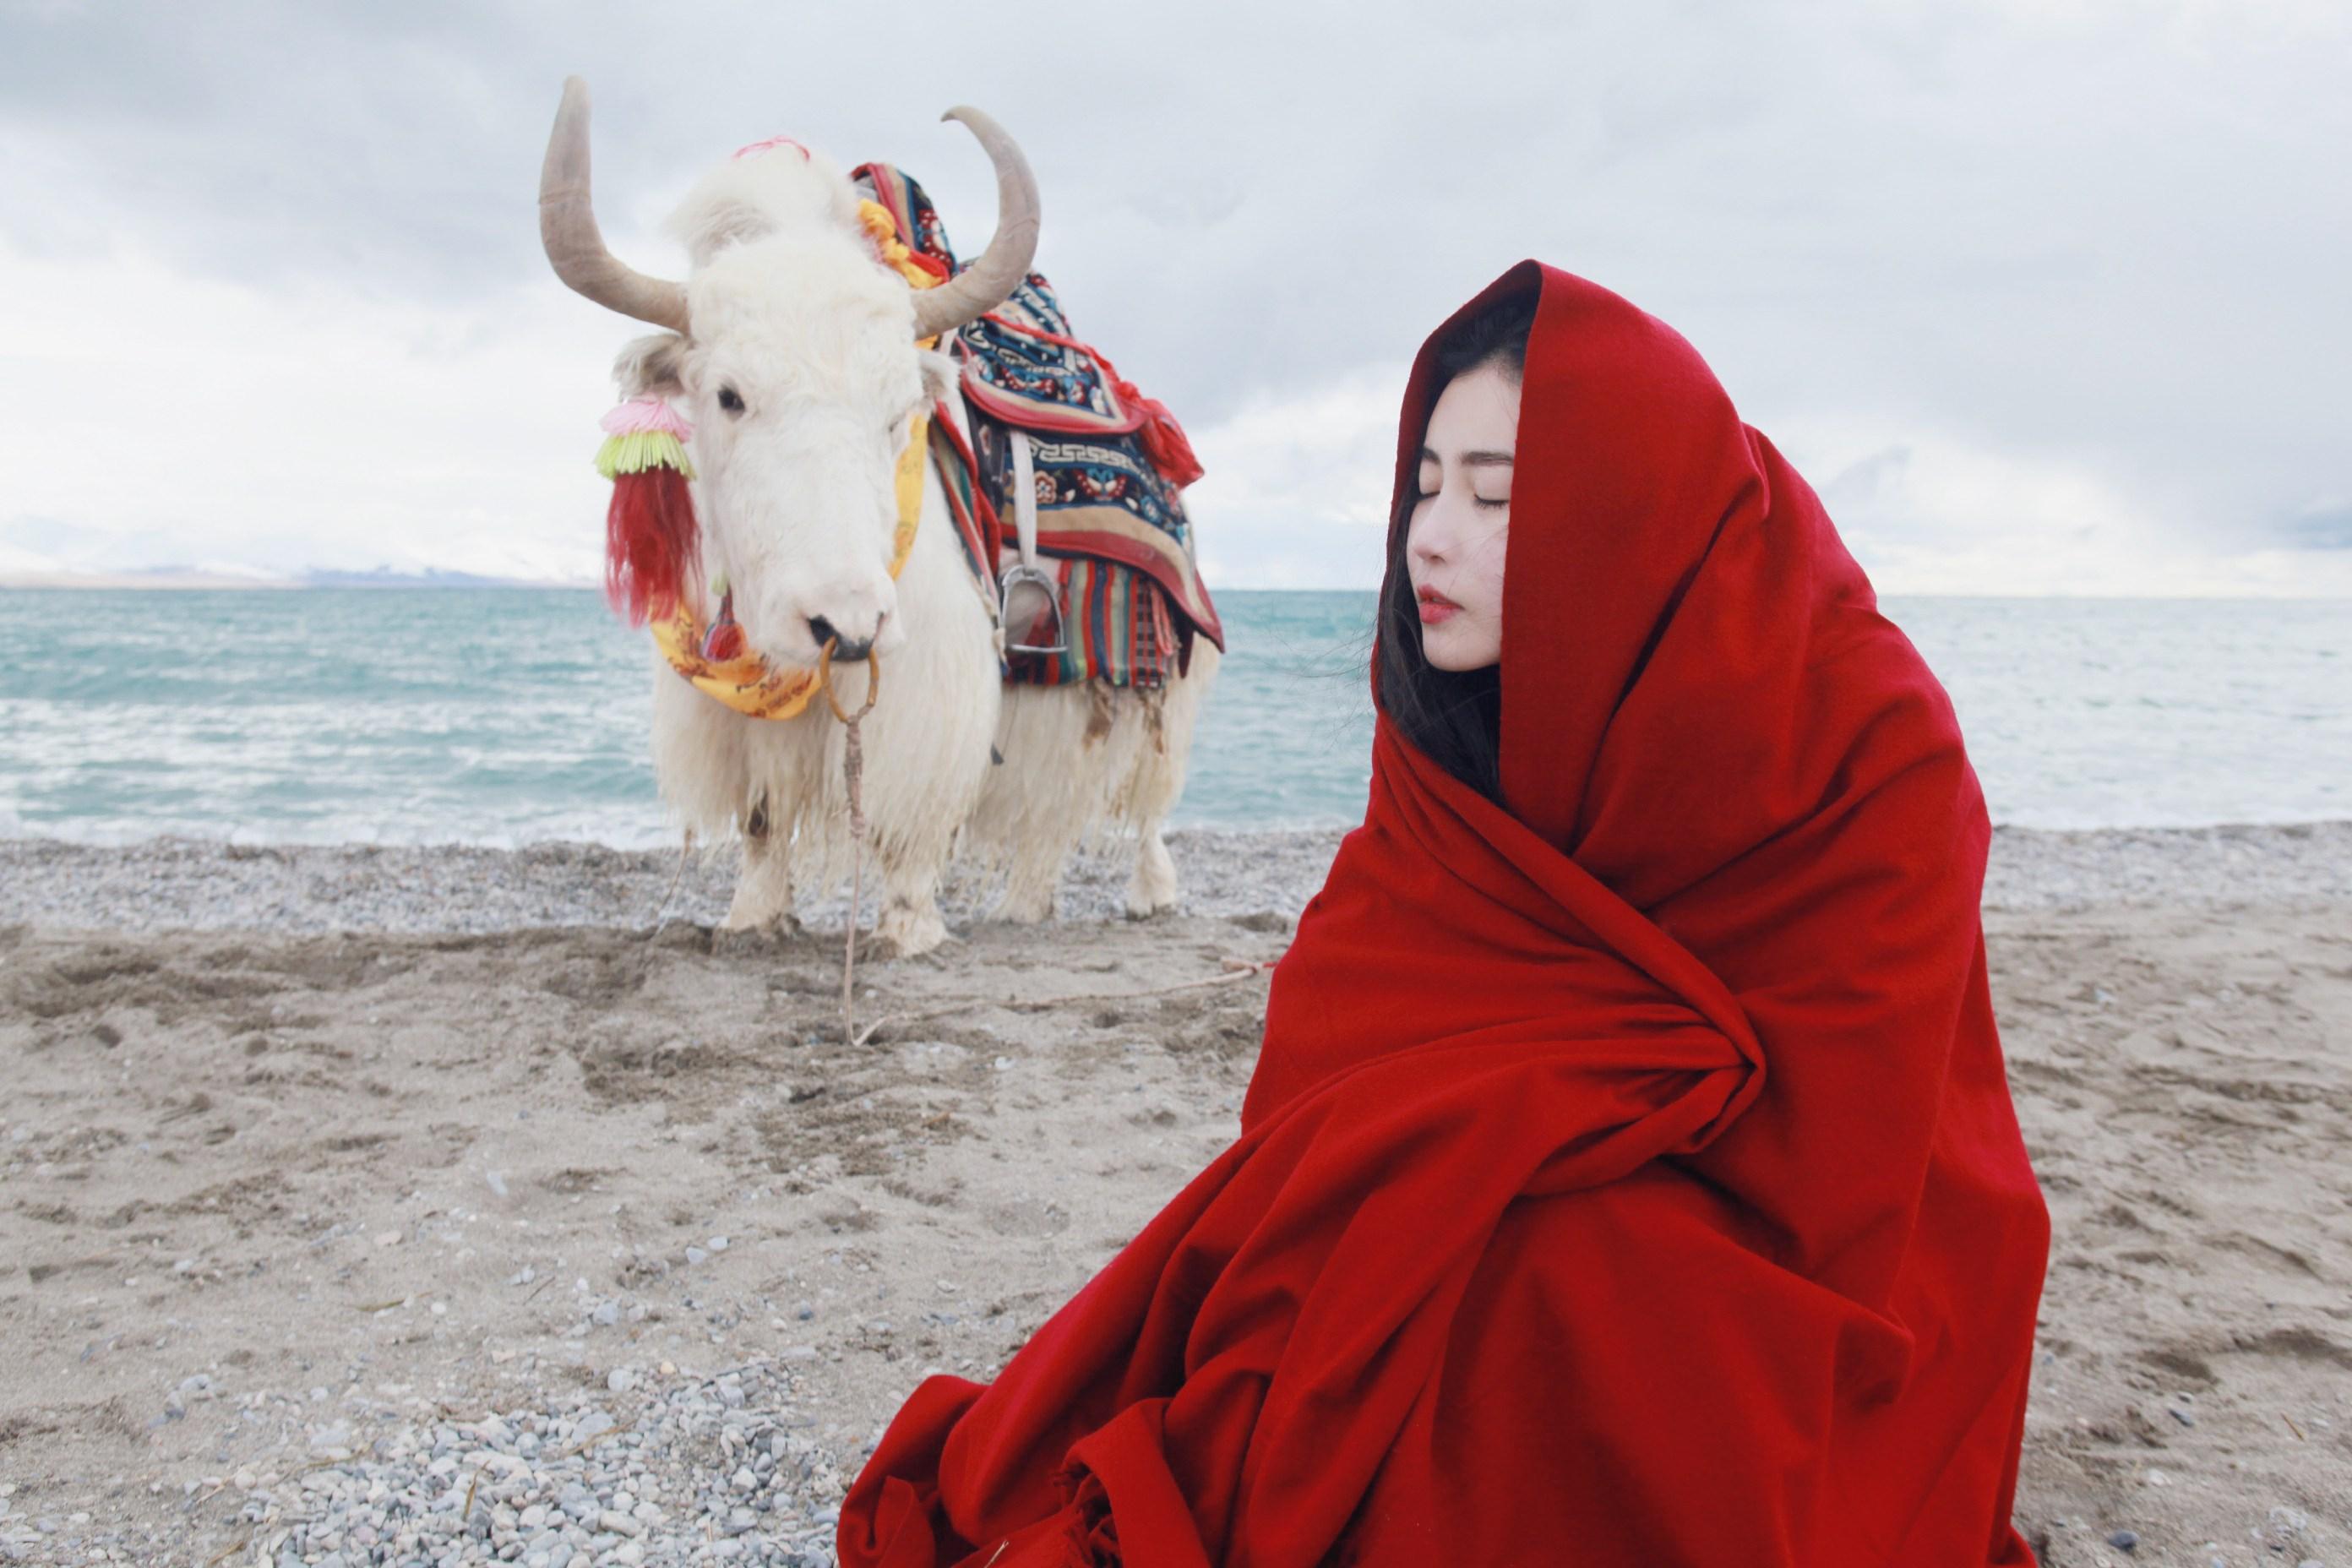 Tibet goes hi-tech to promote tourism, culture